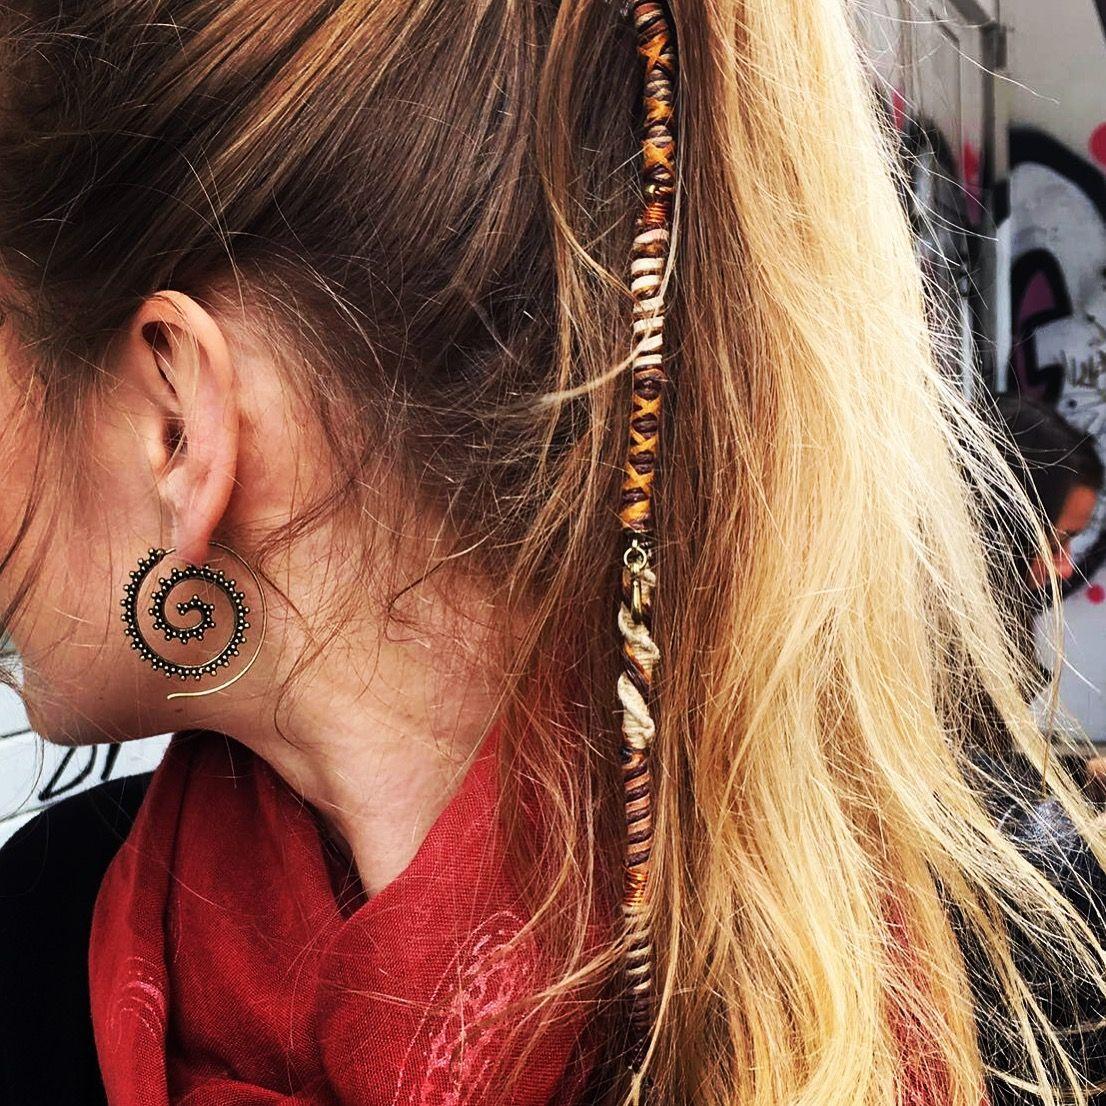 Beautiful Hairwrap By Dikaricrafts Hairwrap Bohemian Jewelry Bohemianjewelry Hippie Hair Hair Styles Boho Hair Wrap